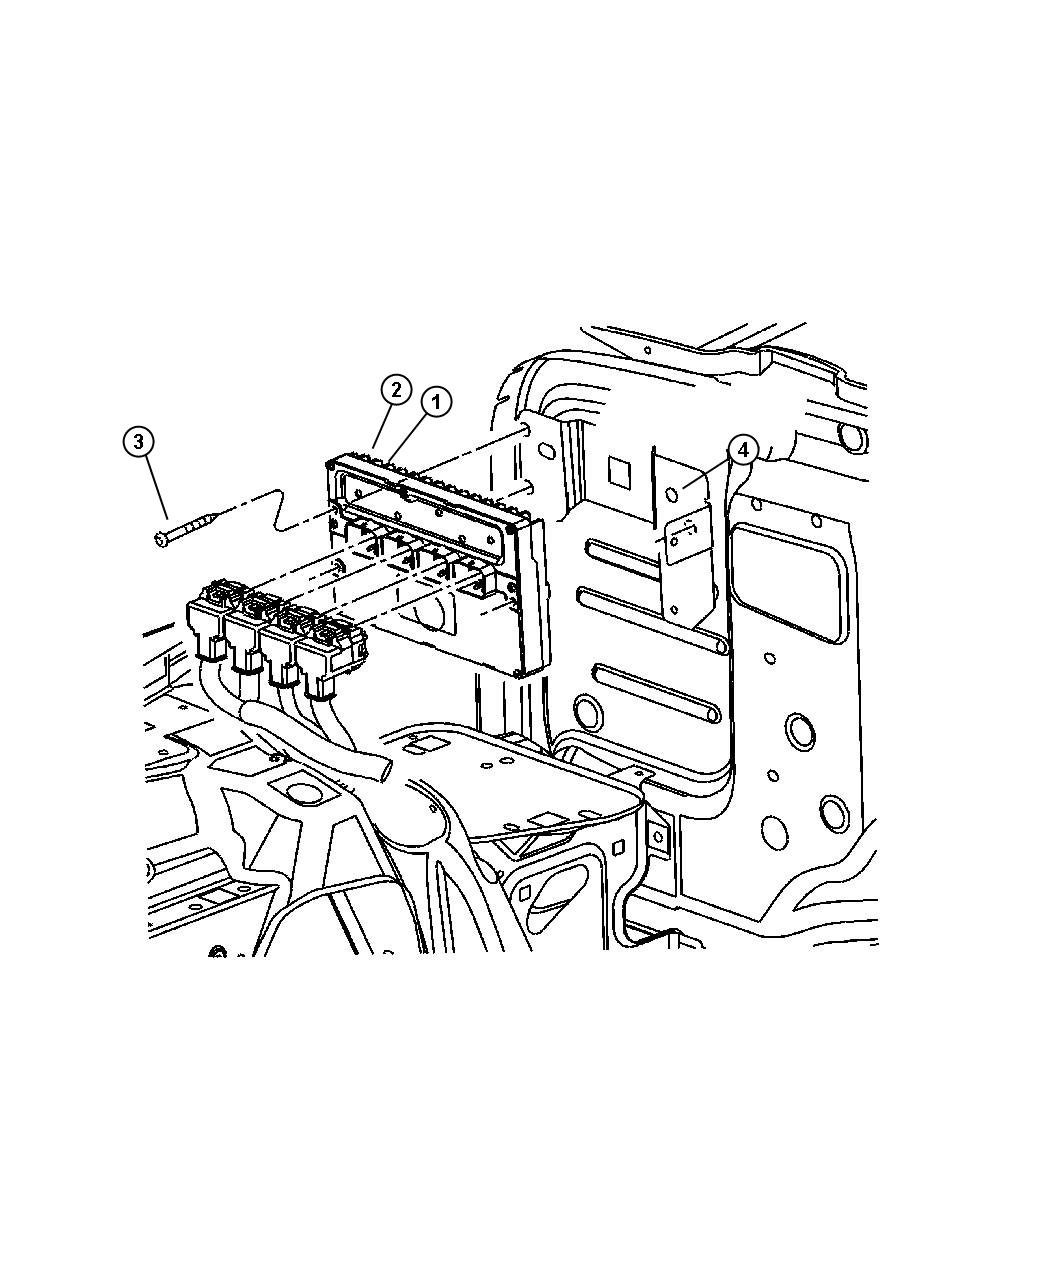 Jeep Wrangler Module. Powertrain control. Generic